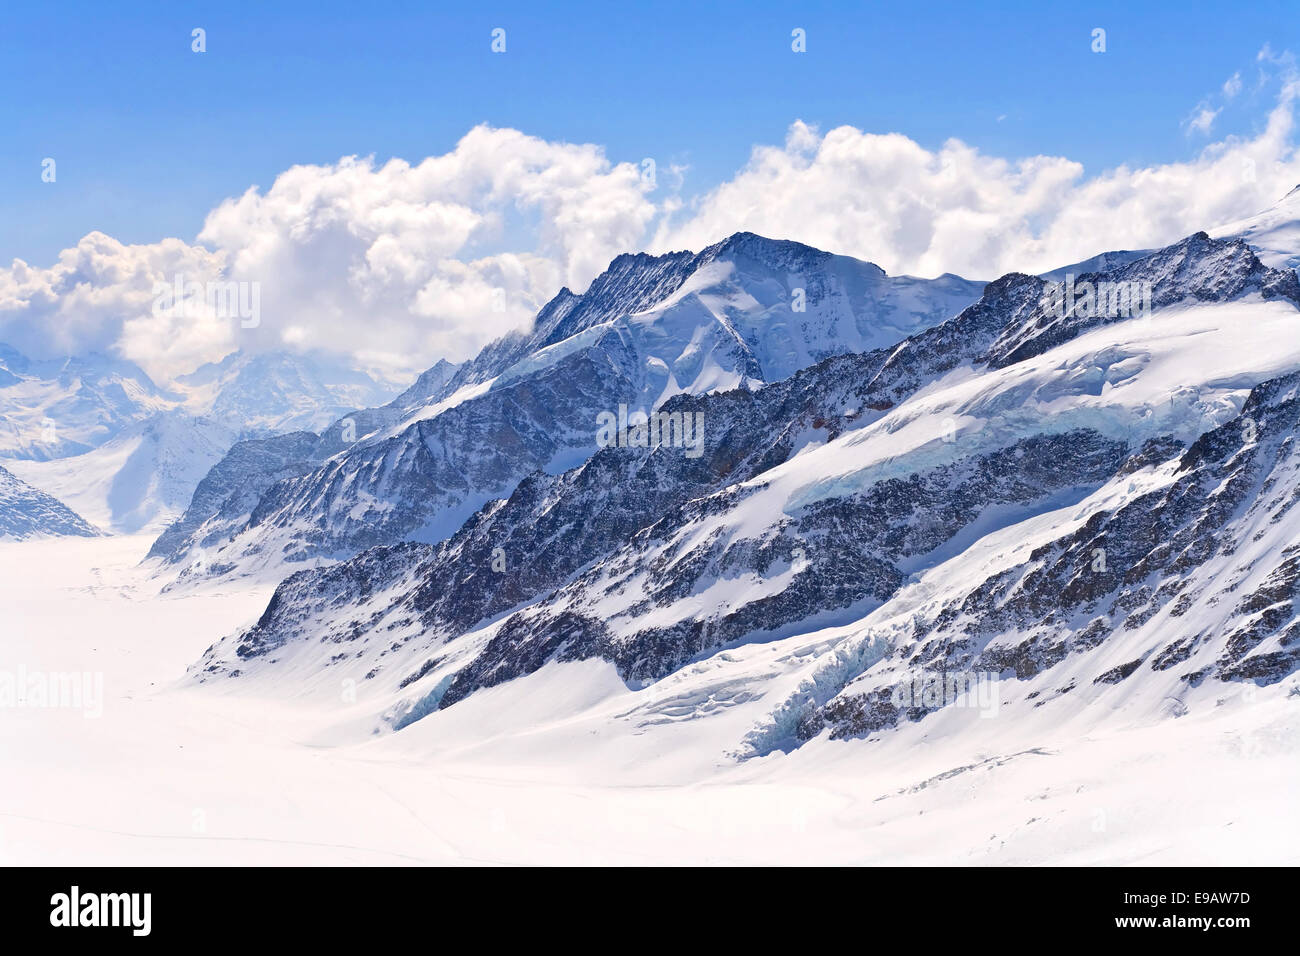 Aletsch alps glacier Switzerland - Stock Image